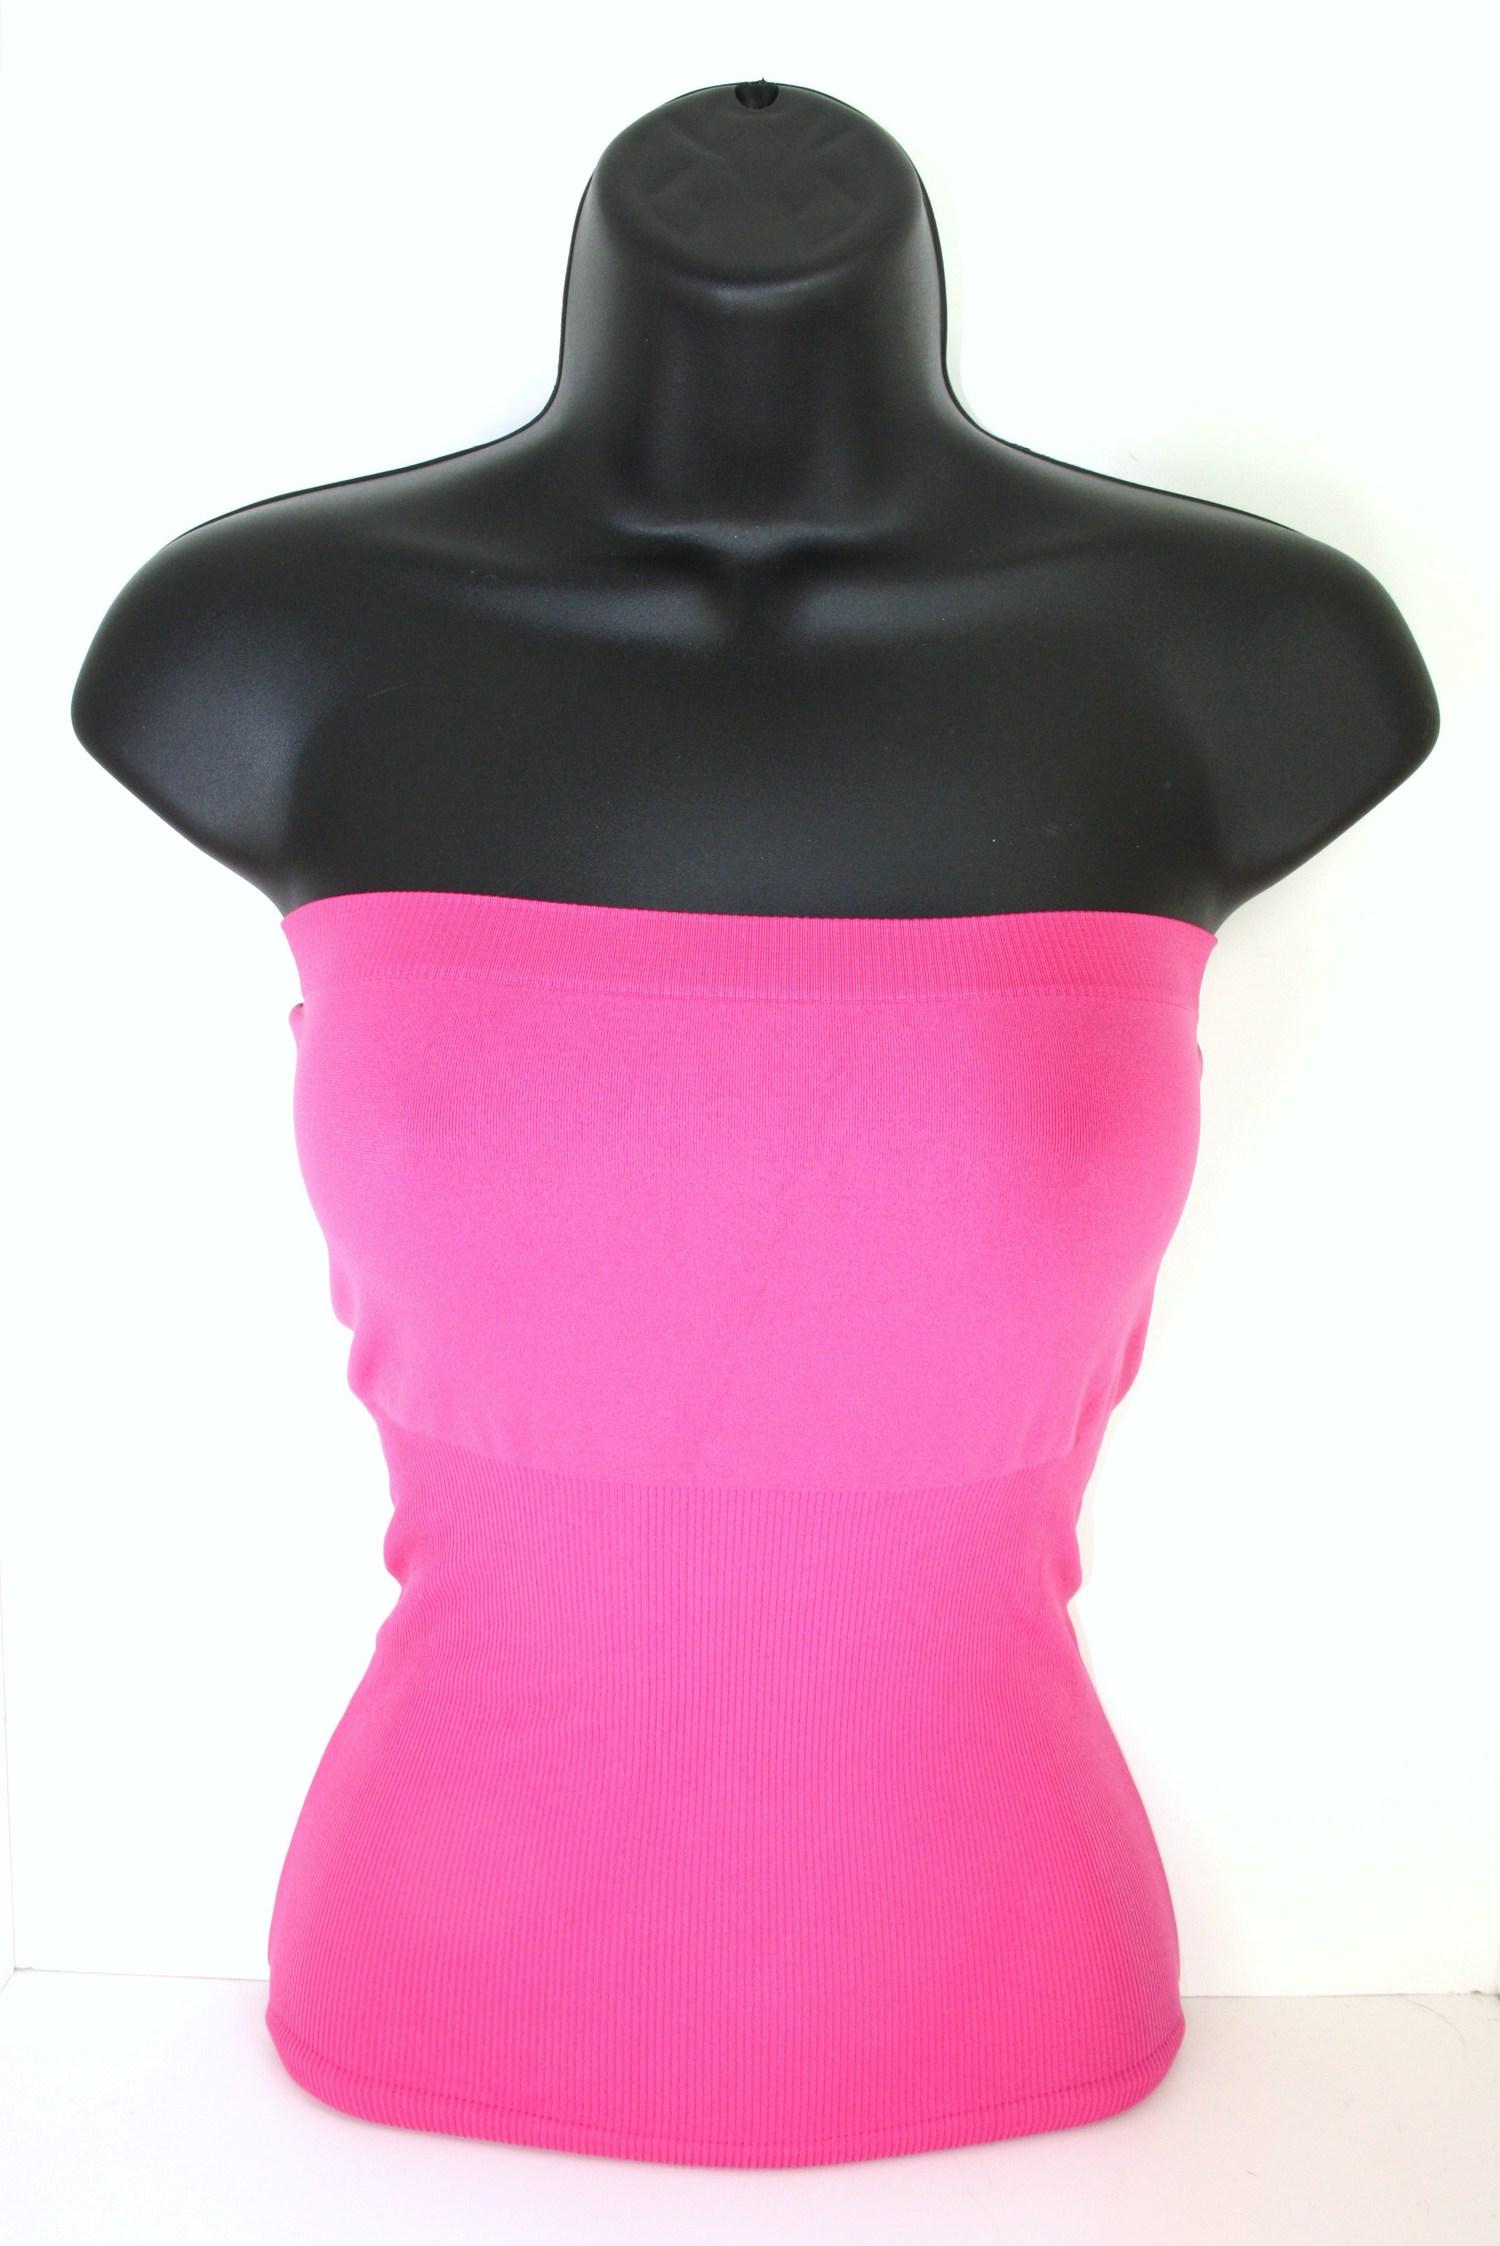 7554fe5dc8e Tube Top - Neon Pink — Kafari Scarf